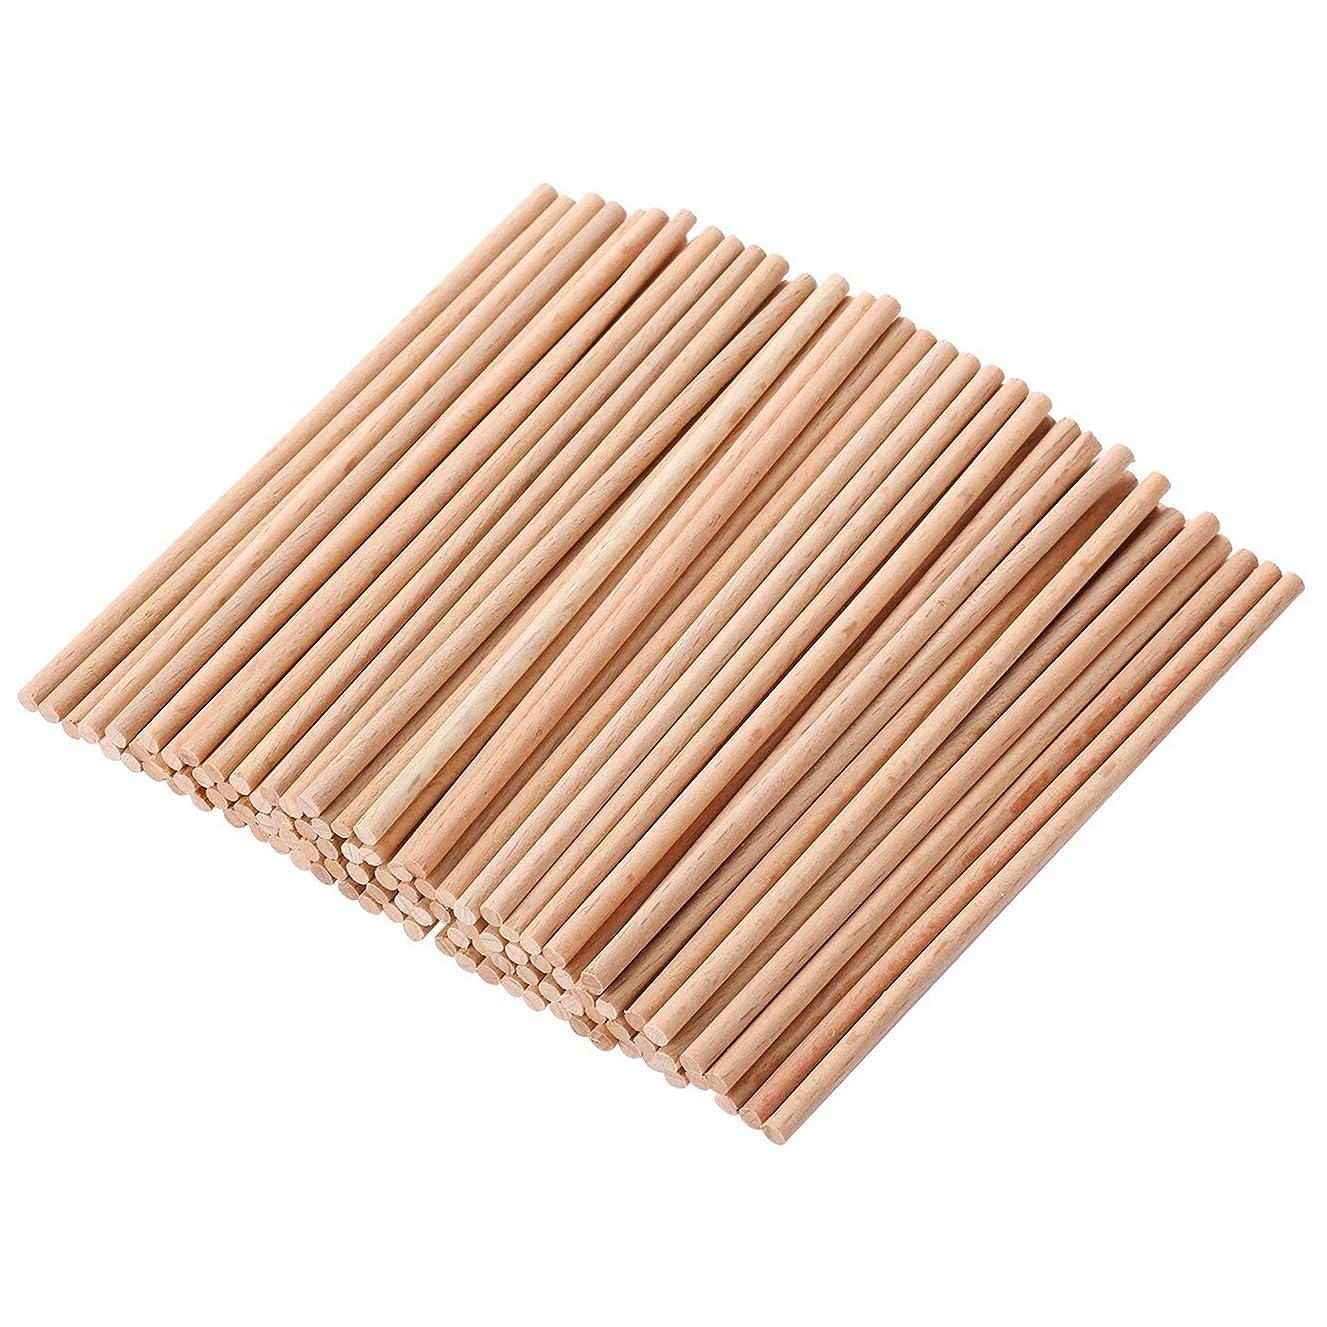 HealthGoodsIn - Natural Bamboo Dowel Sticks for Craft Projects | Project Dowel Sticks Made of Natural Bamboo (Pack of 100) (15 cm)